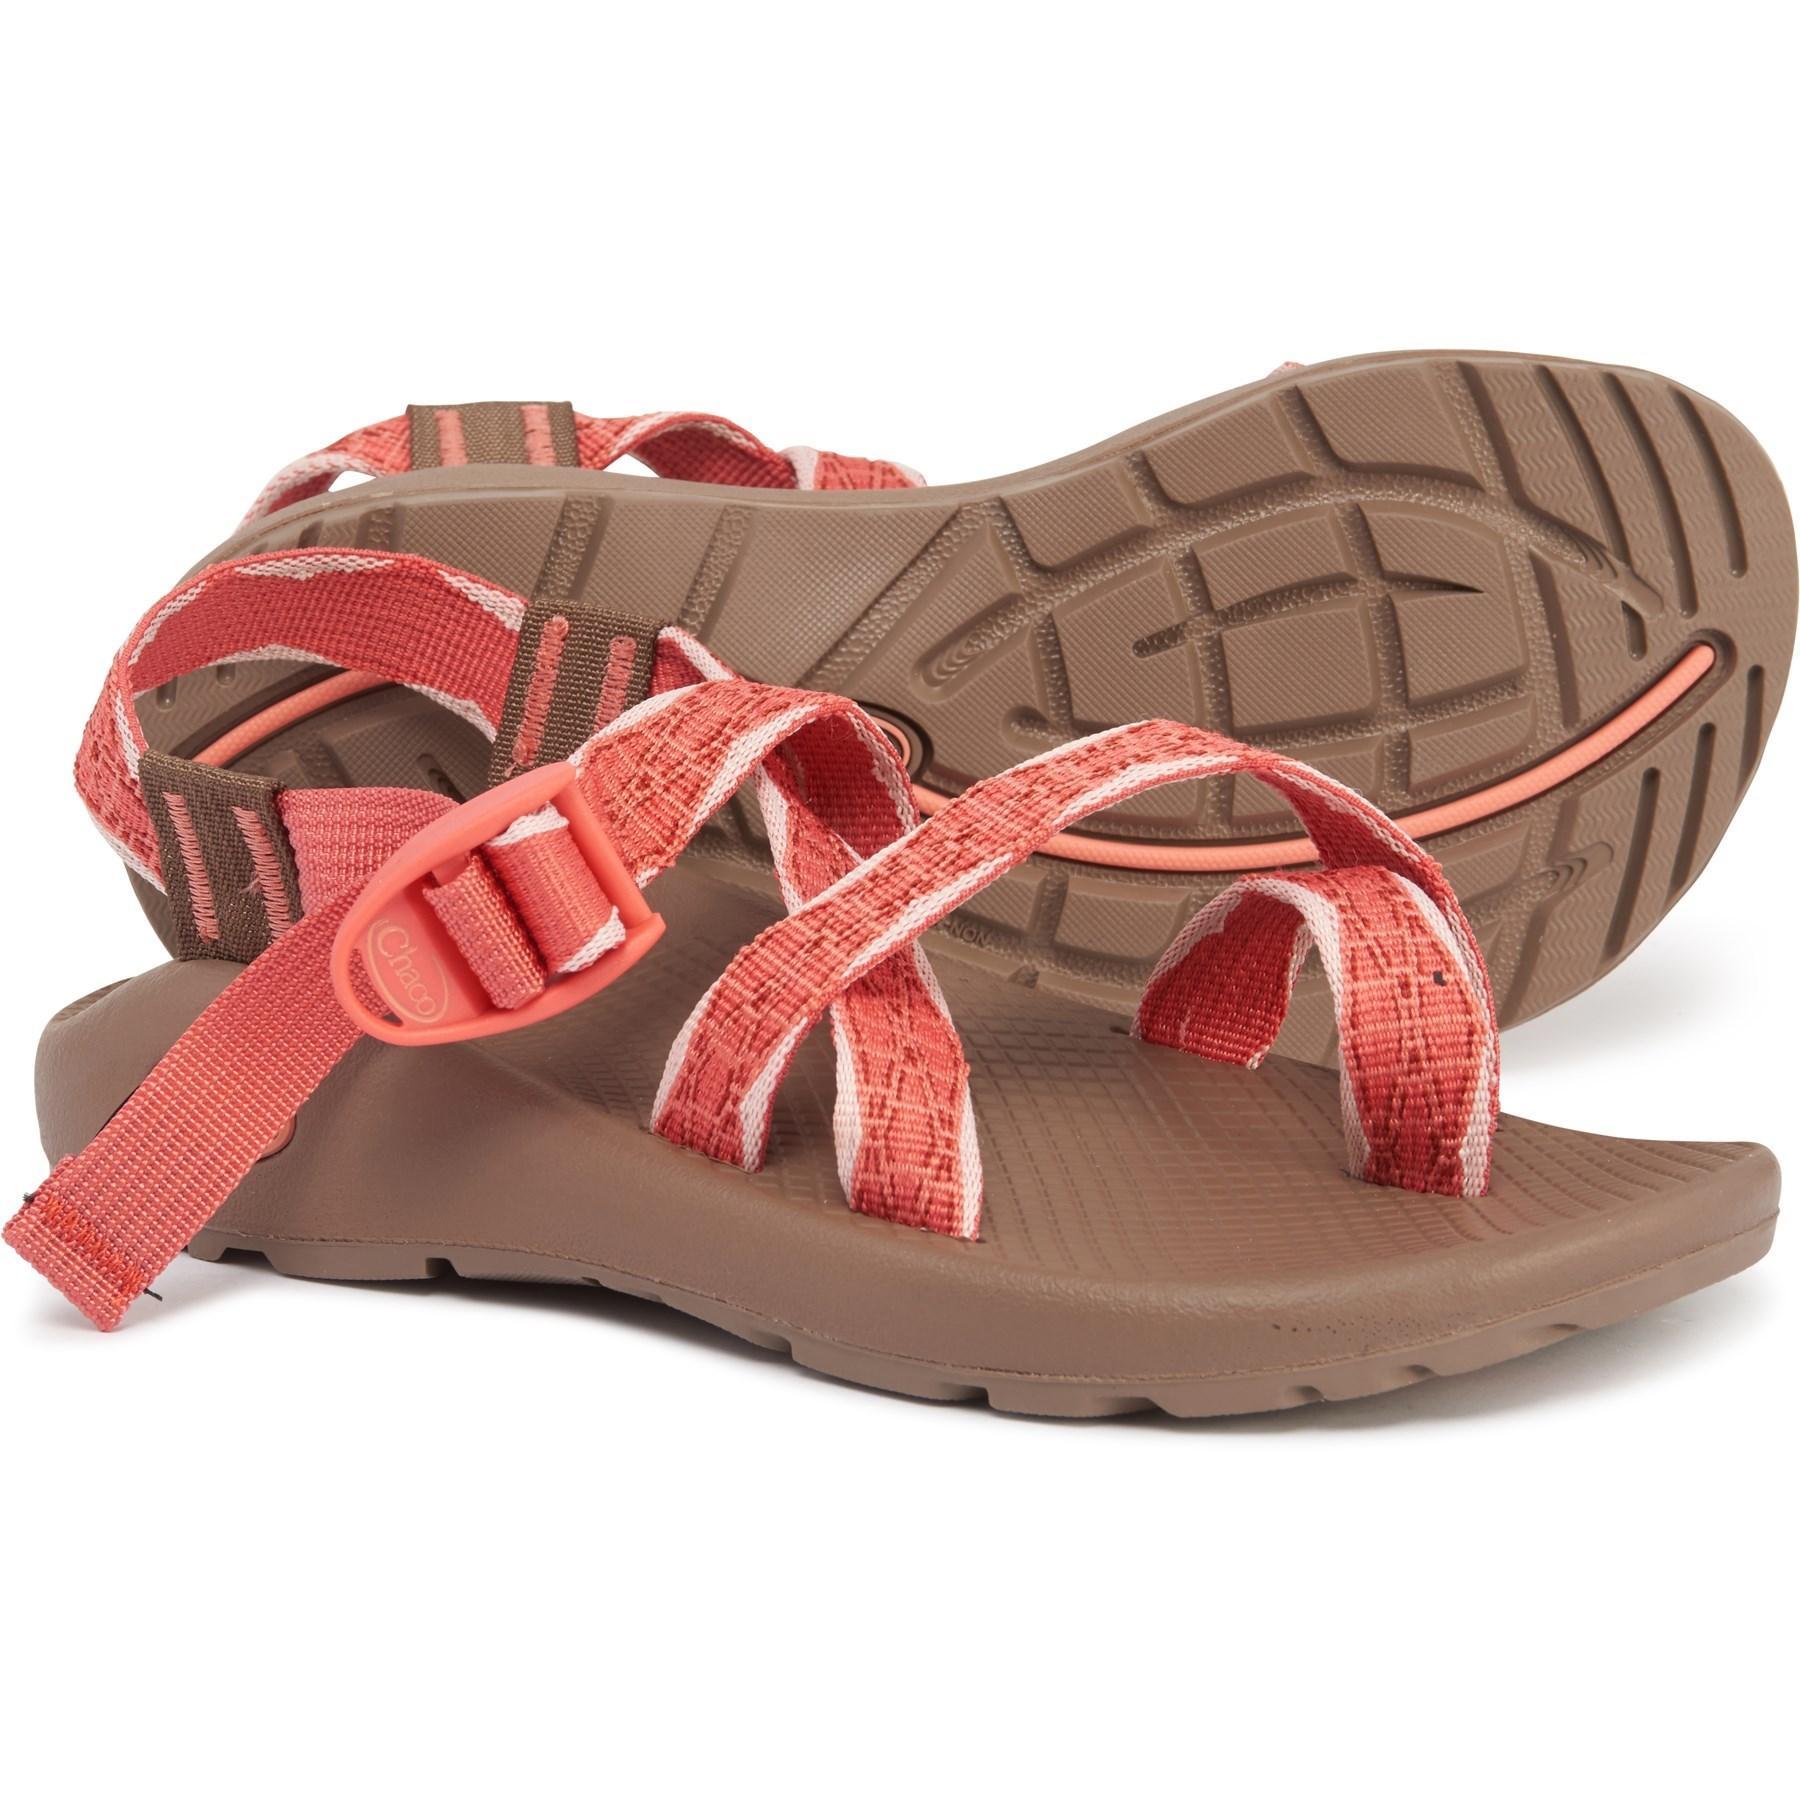 b5b3e74f6b56 Lyst - Chaco Z 2 Classic Sport Sandals (for Women)